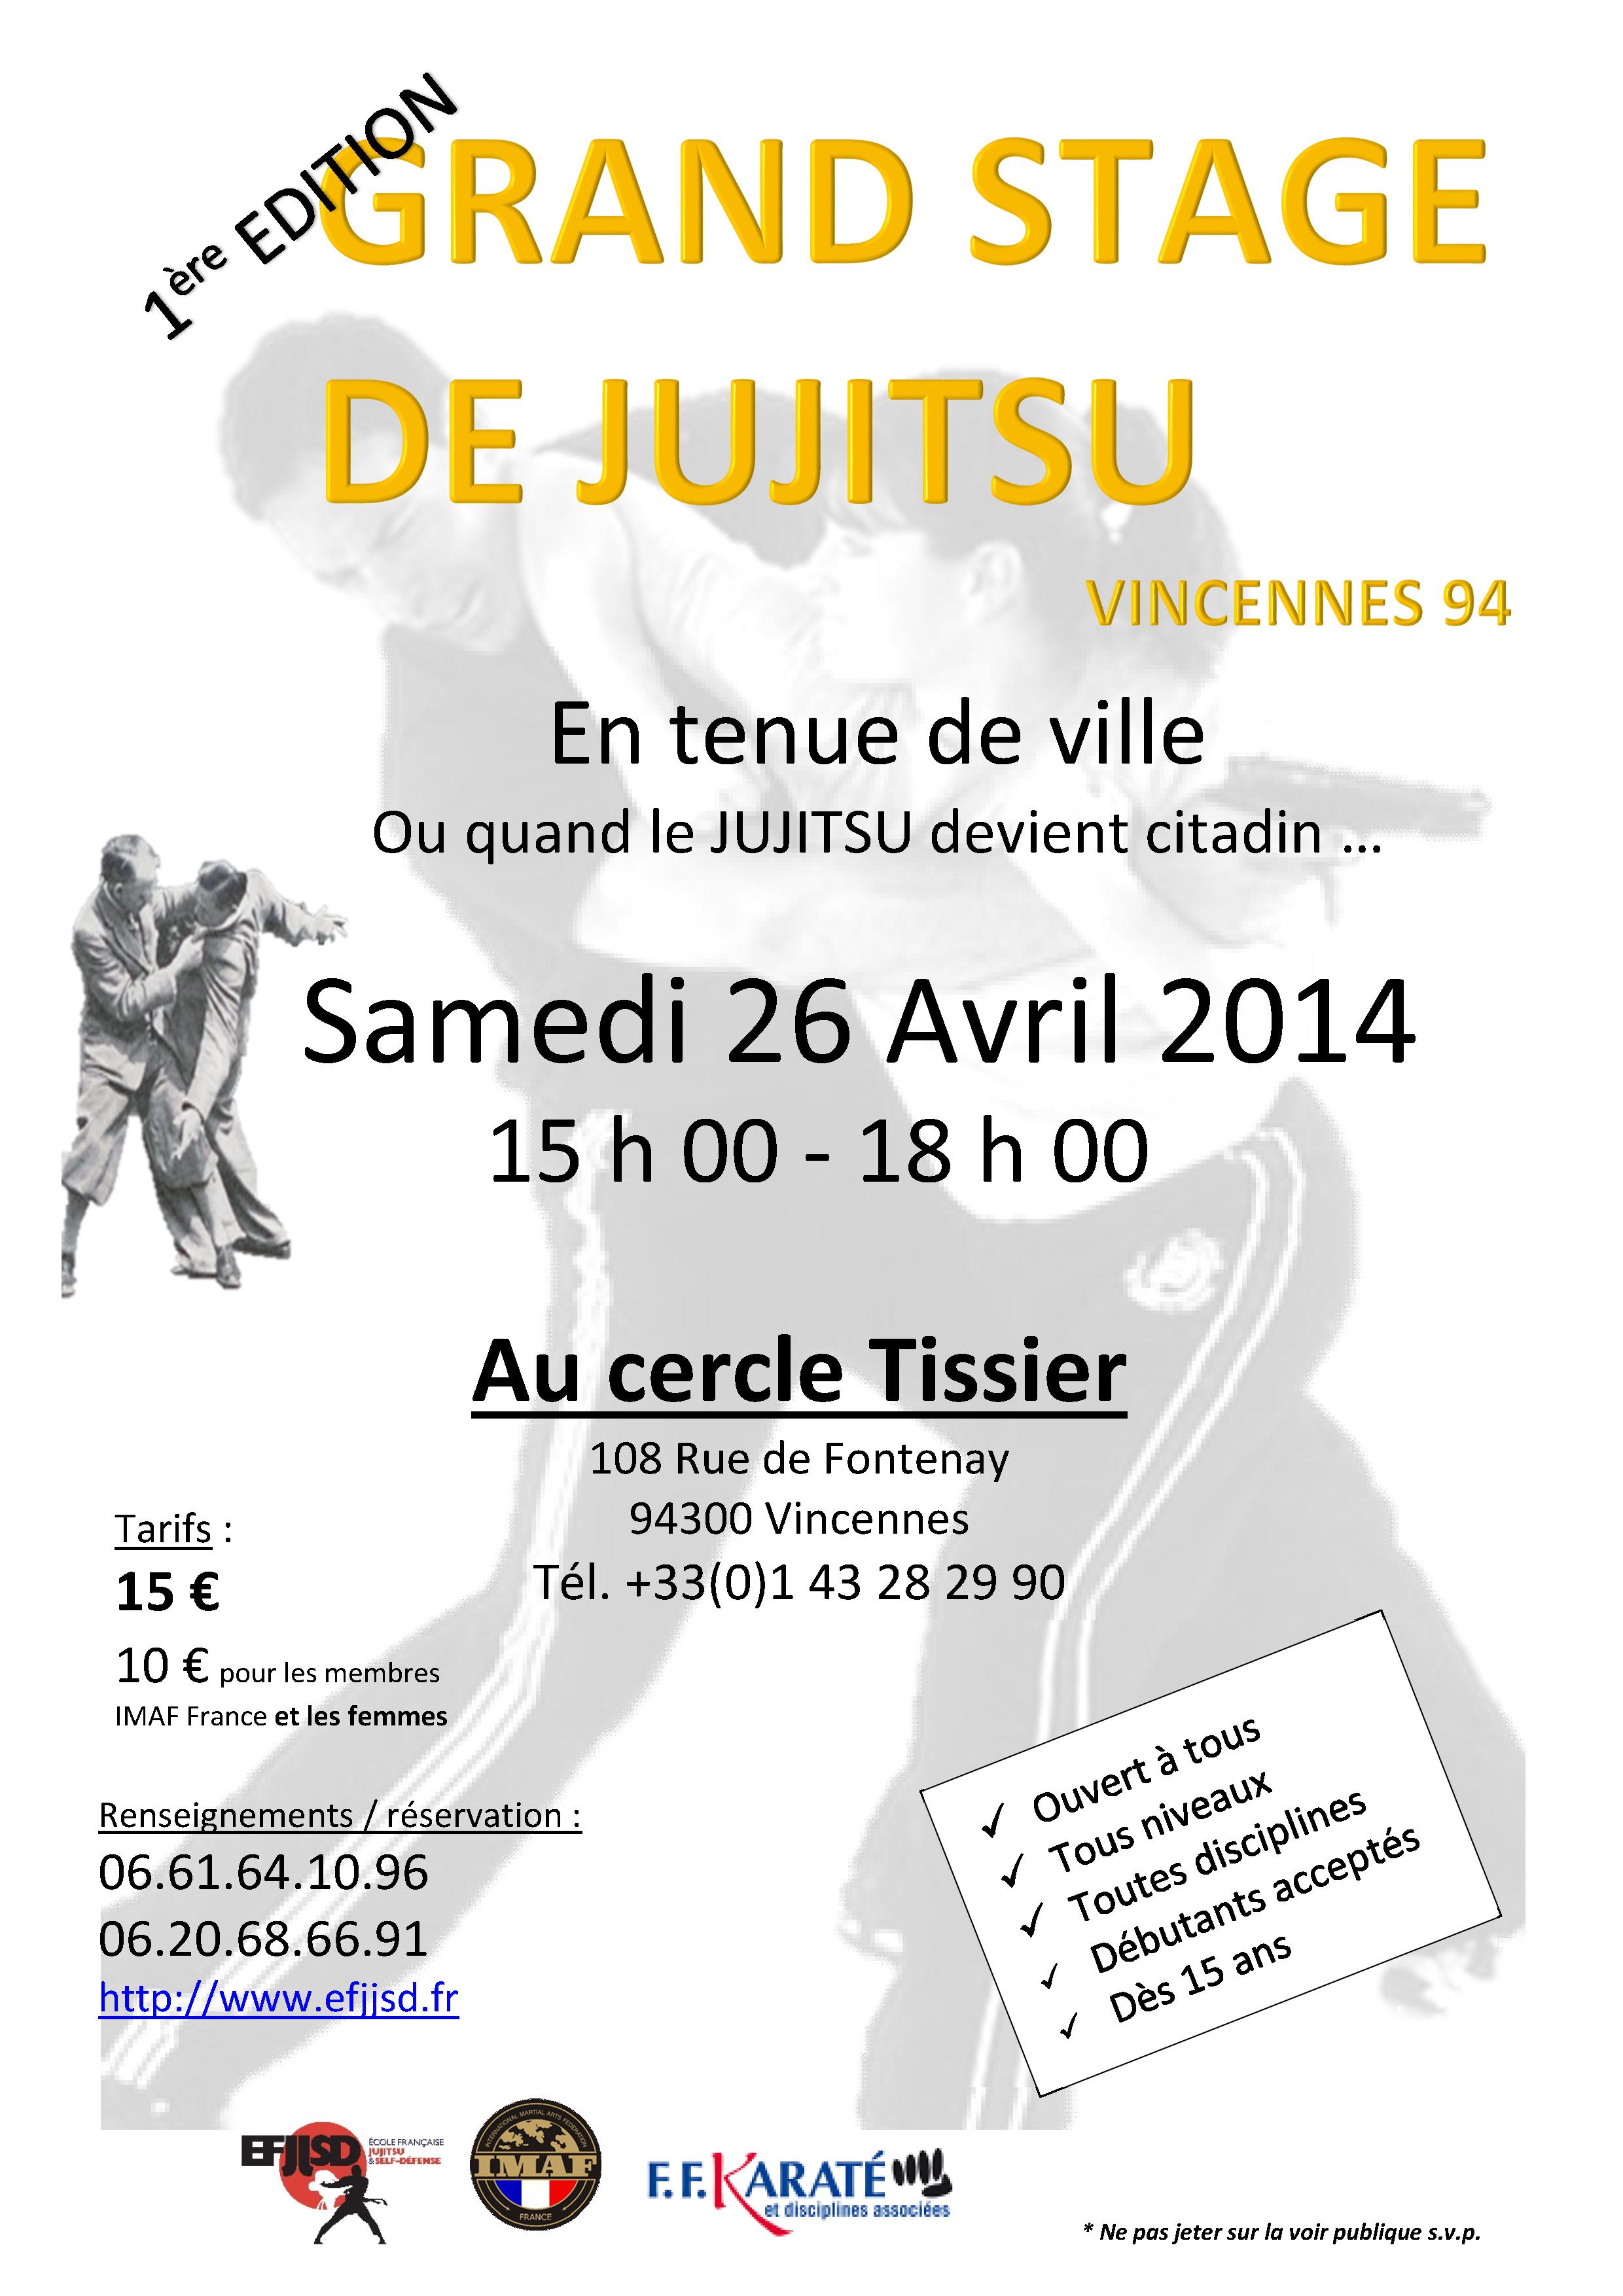 affiche-stage-jujitsu-26-avril-201-efjjsd-special-jujitsu-citadin Page 1